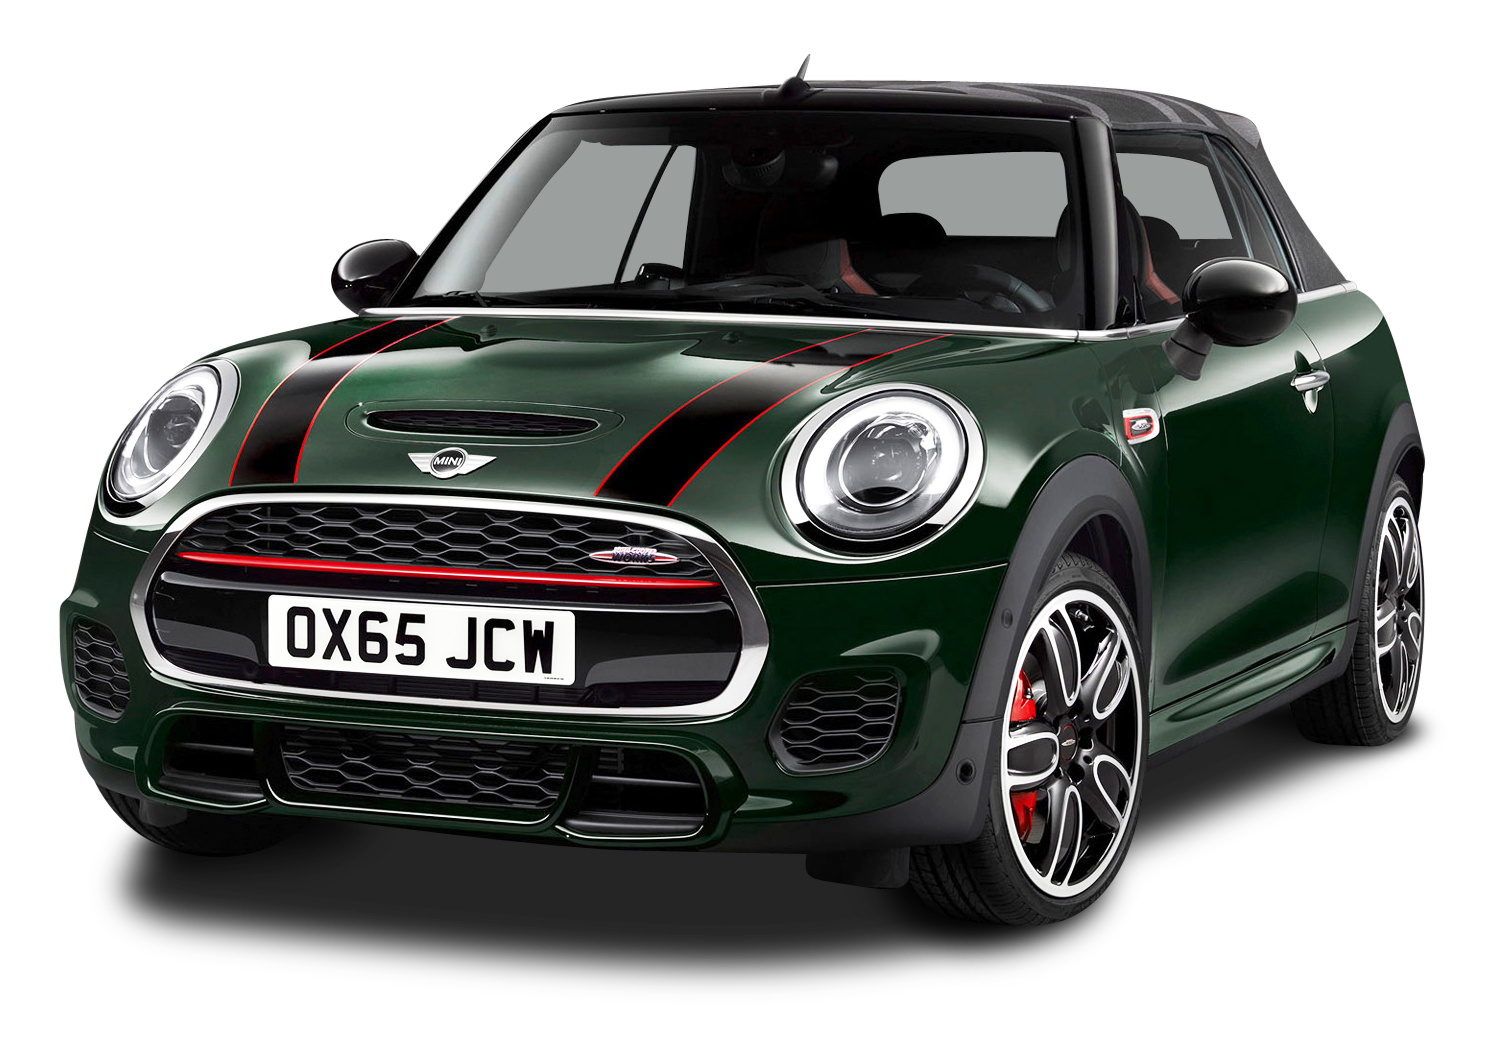 Mini John Cooper Works Green Car